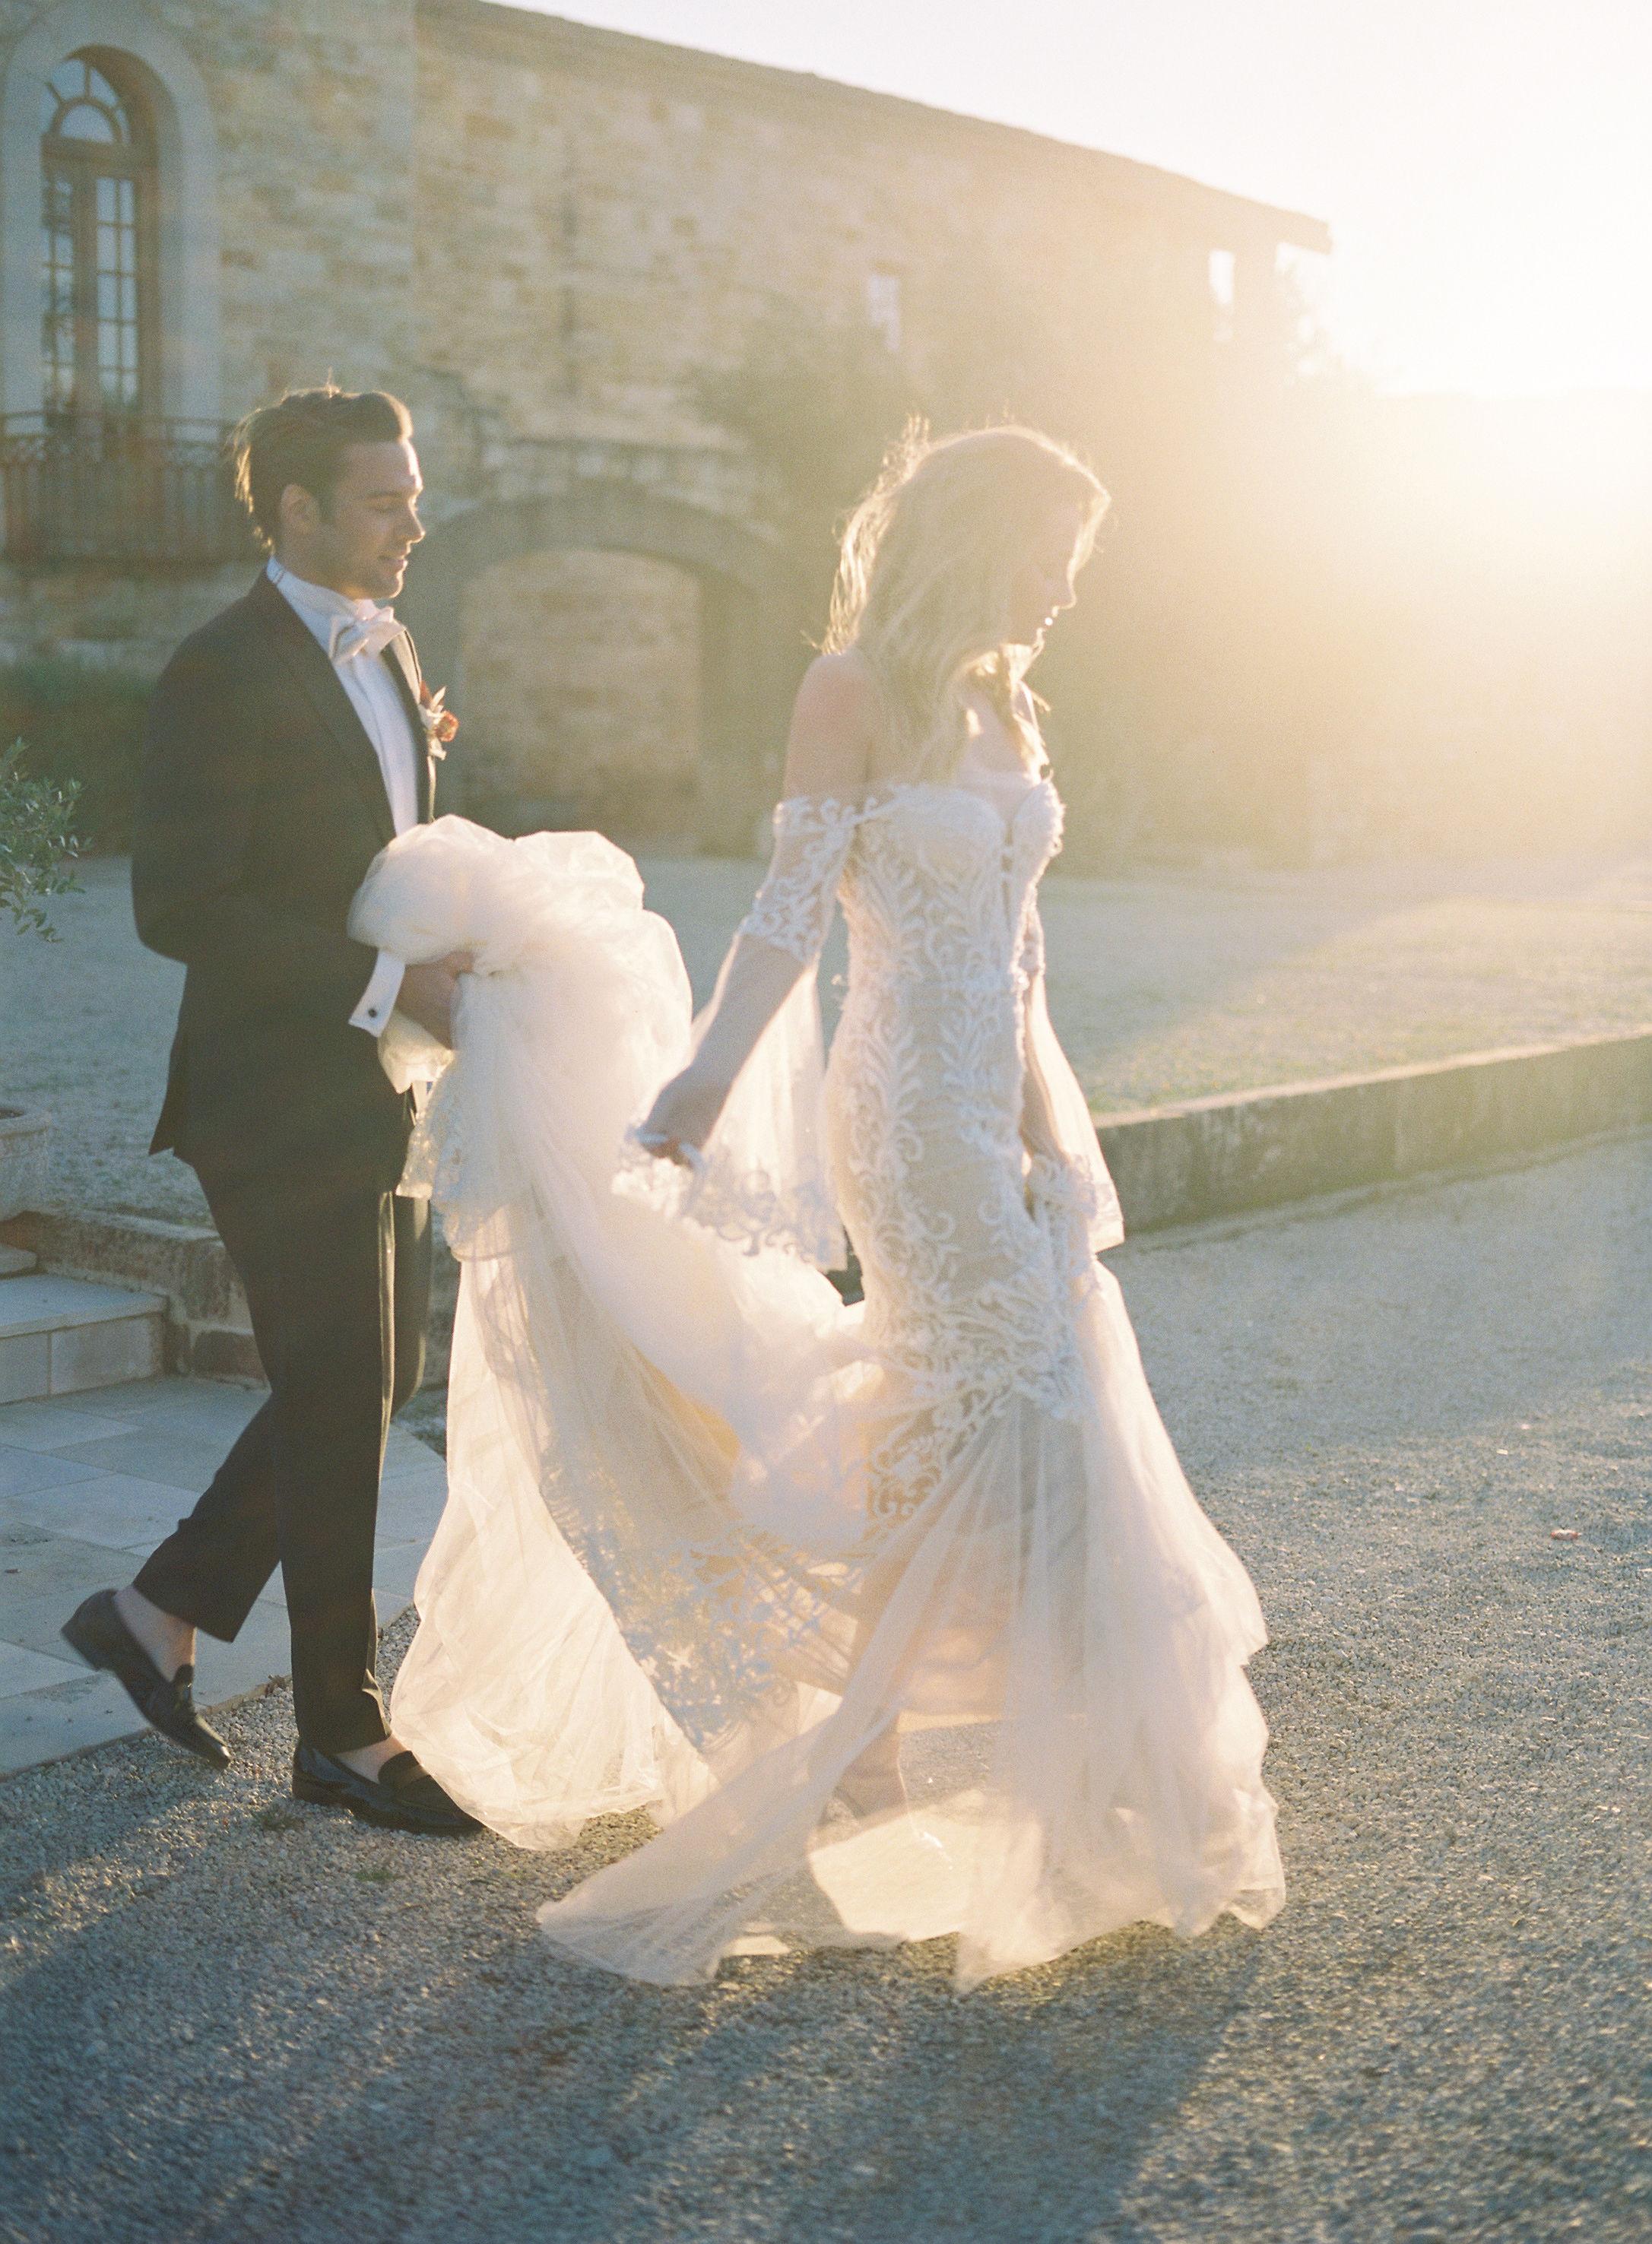 jessica-zimmerman-events-sunstone-bride-groom-getaway-sunset.jpg